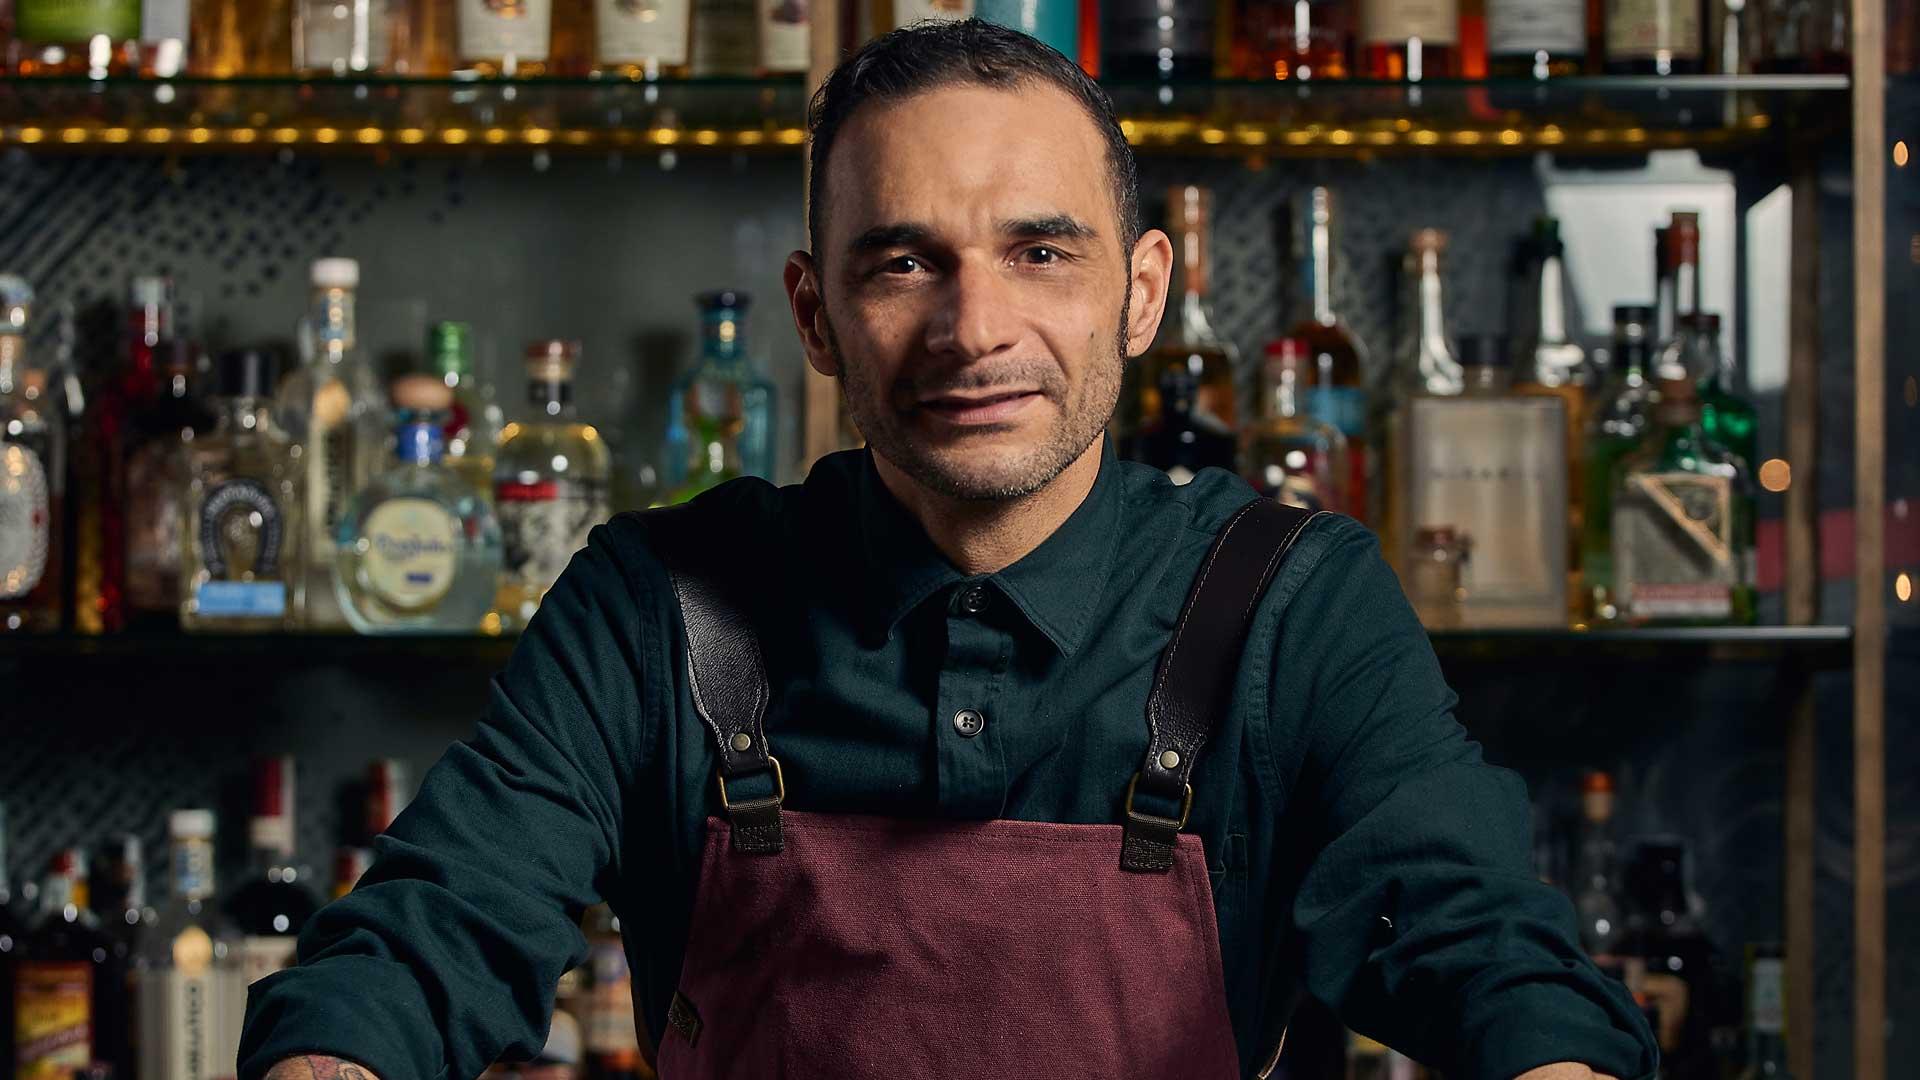 Joy-Napolitano-bar-manager-Chapter-Roma-Coqtail-Milano